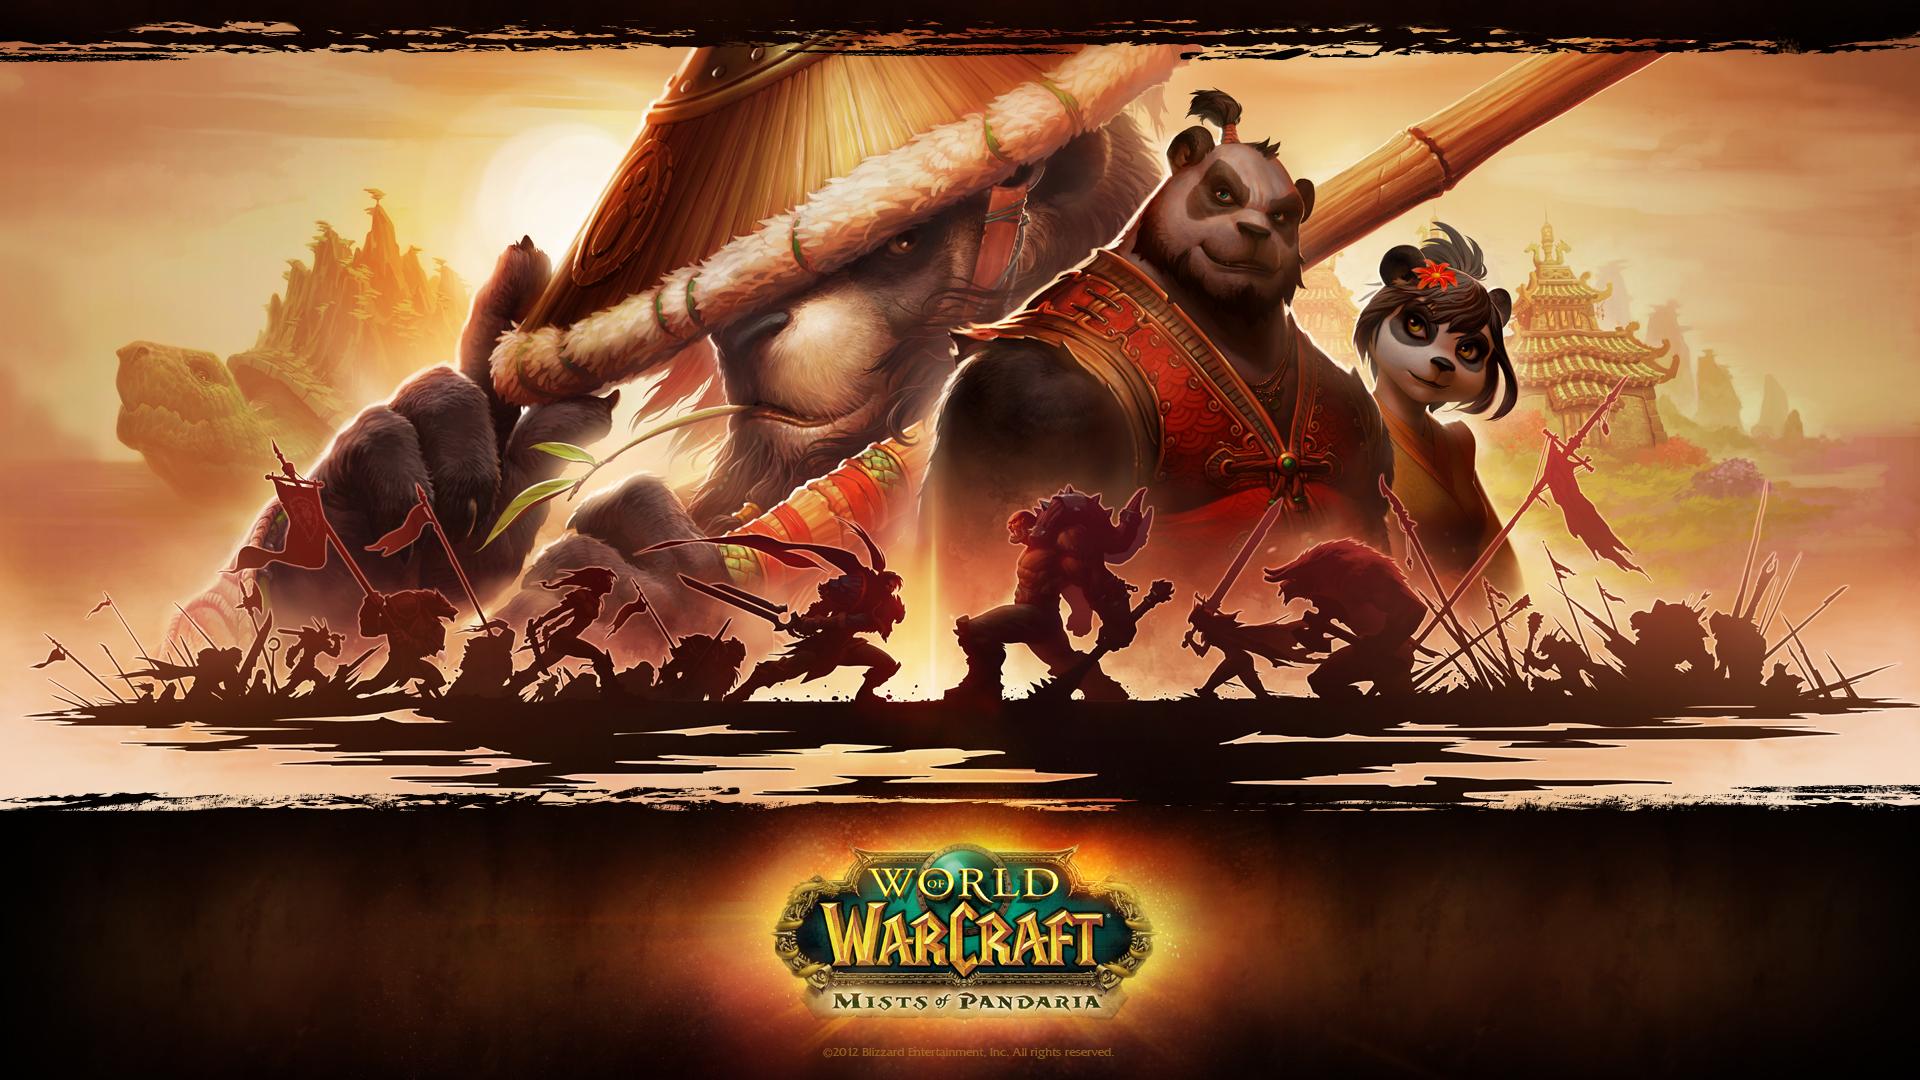 World of Warcraft wallpaper 36